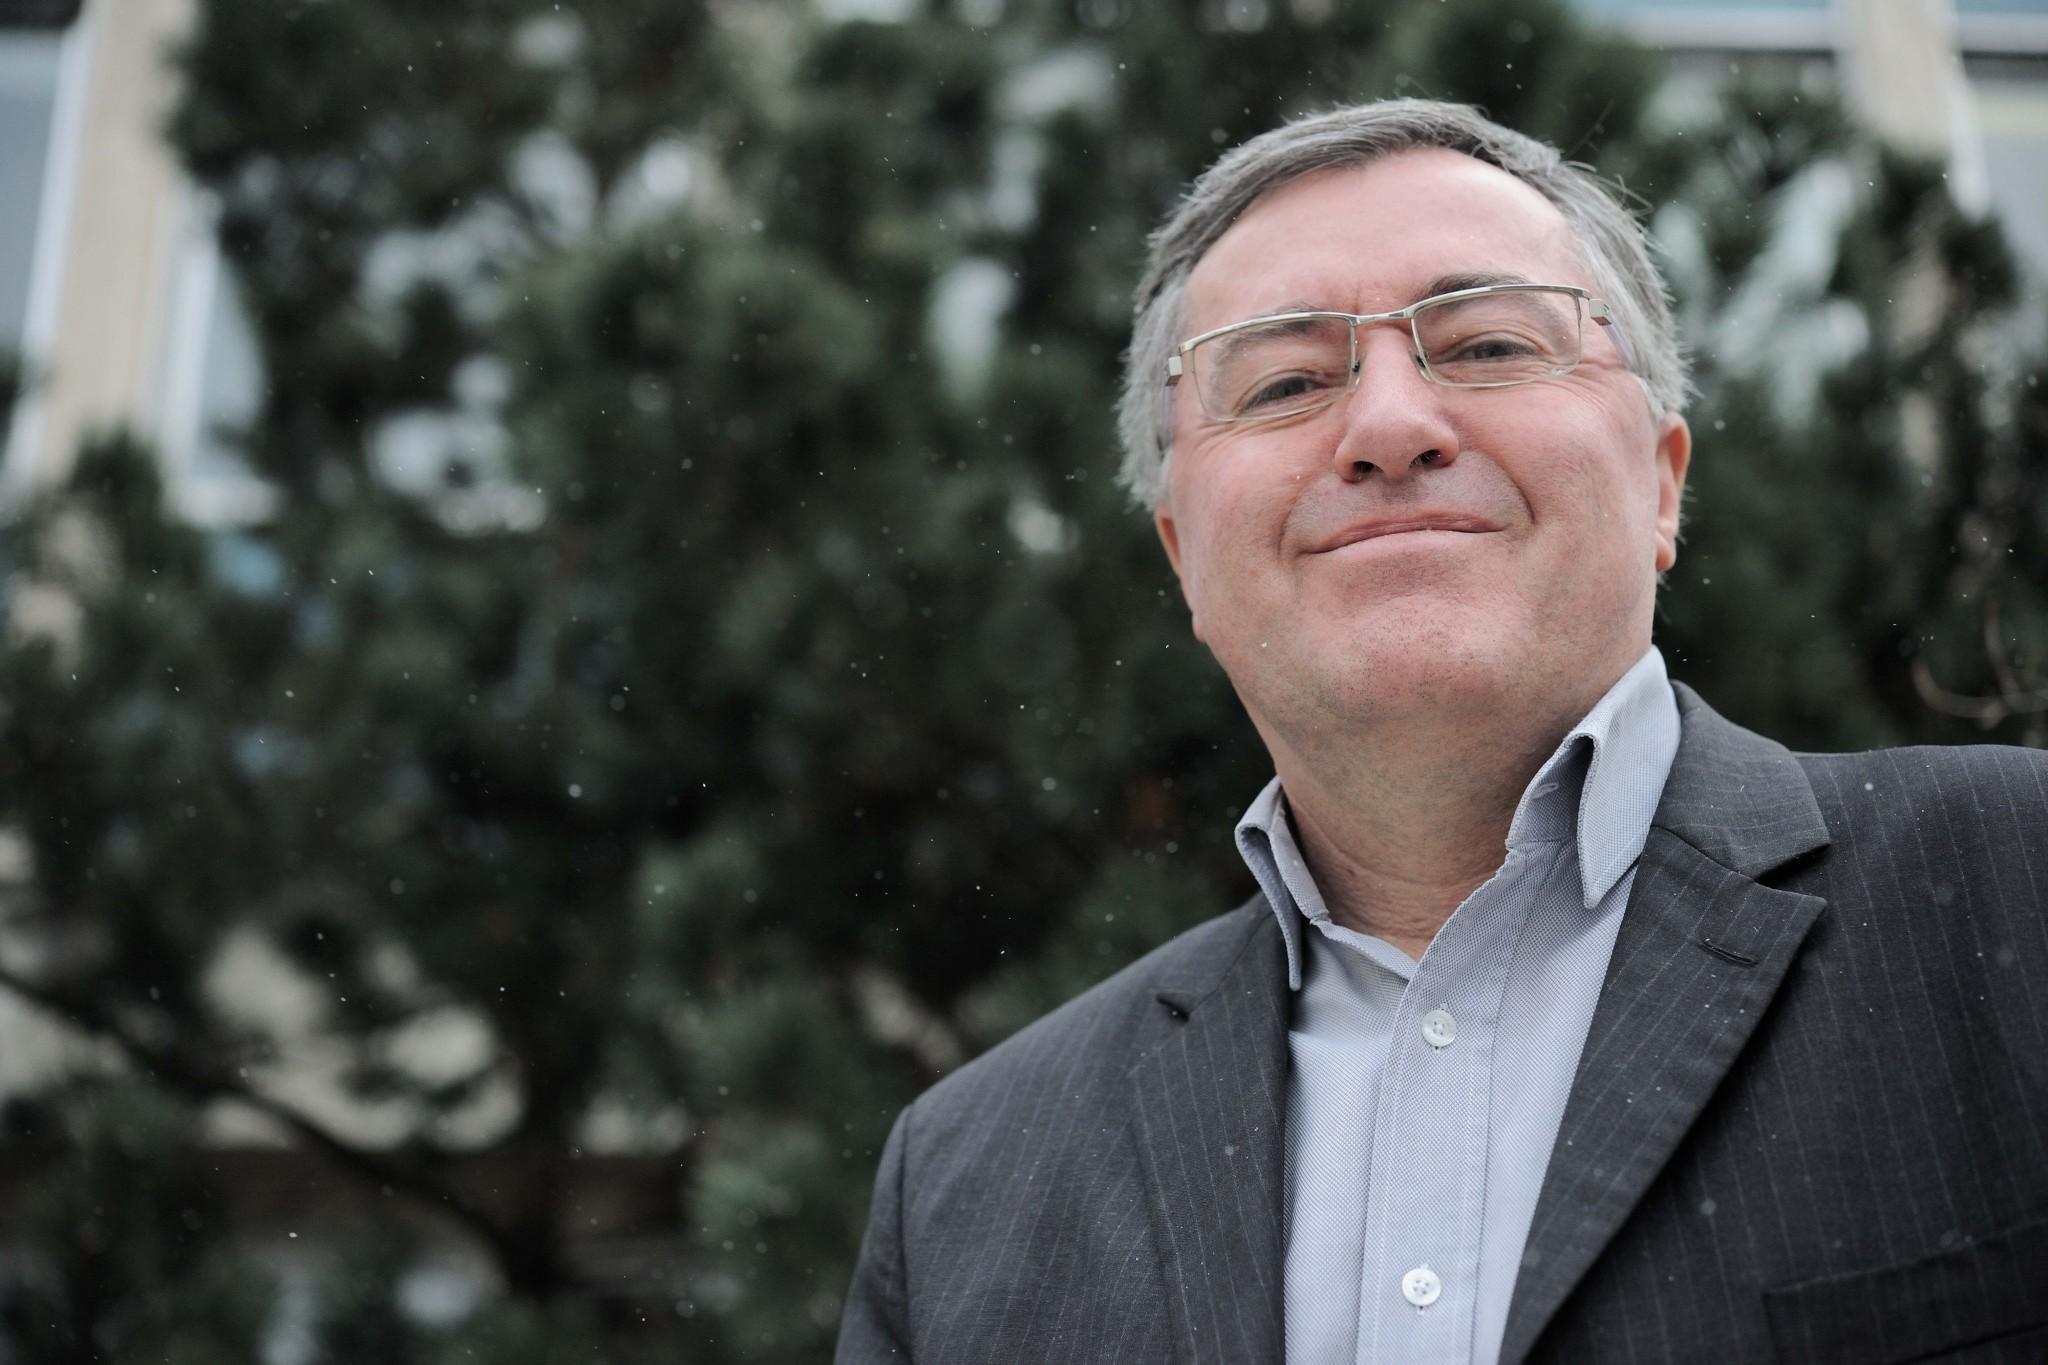 Alain Chabrolle